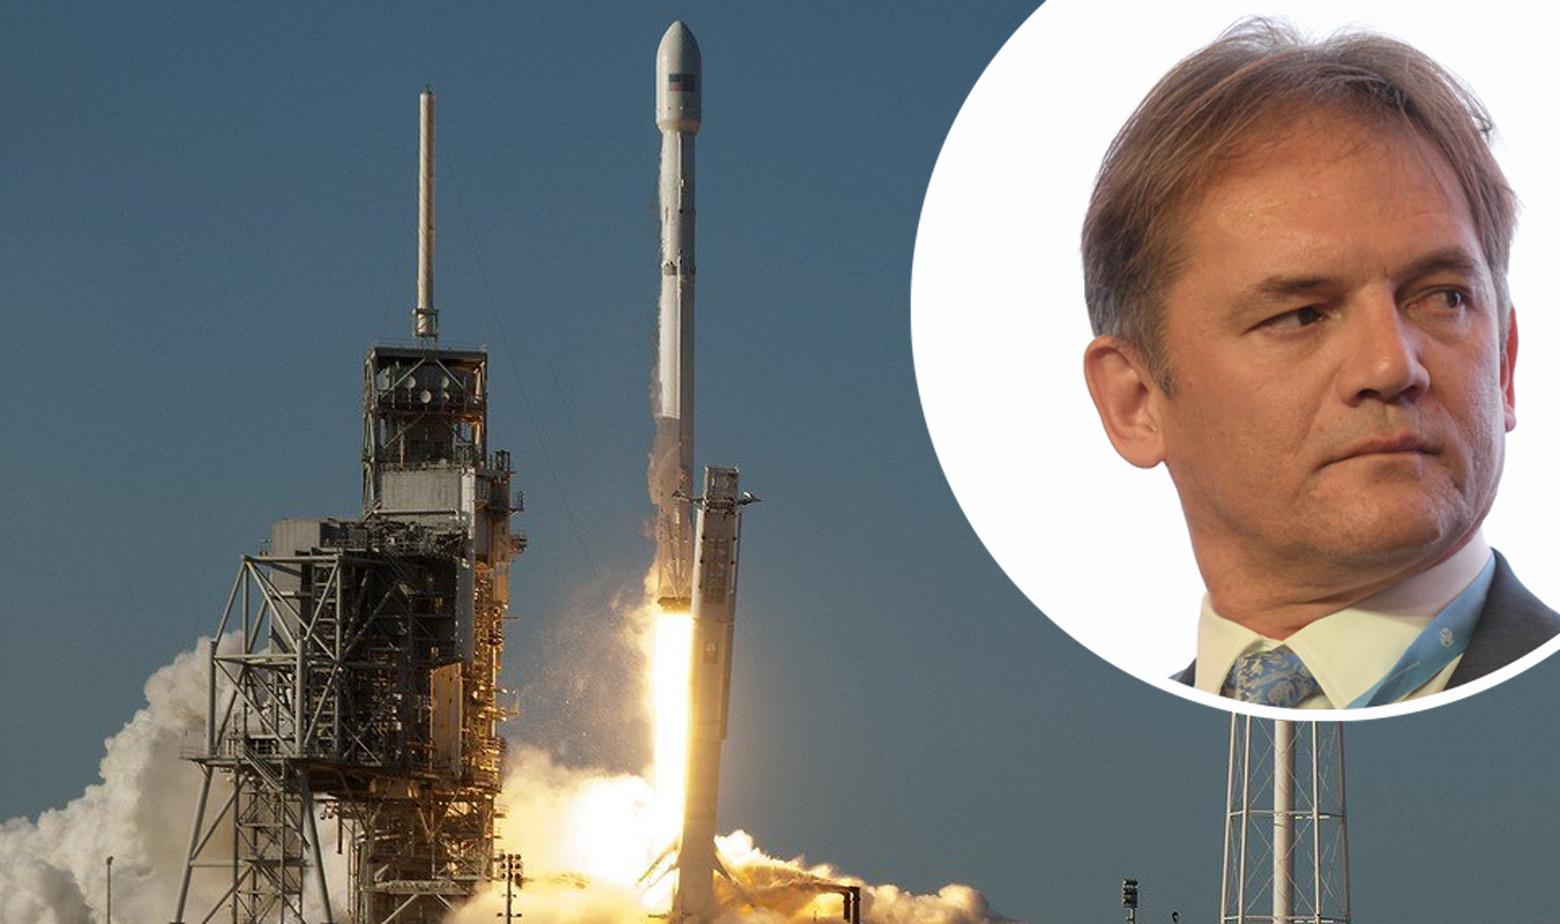 Lansiranje rakete Falcon 9 sa satelitom SES-a i Alen Kurešić u krugu